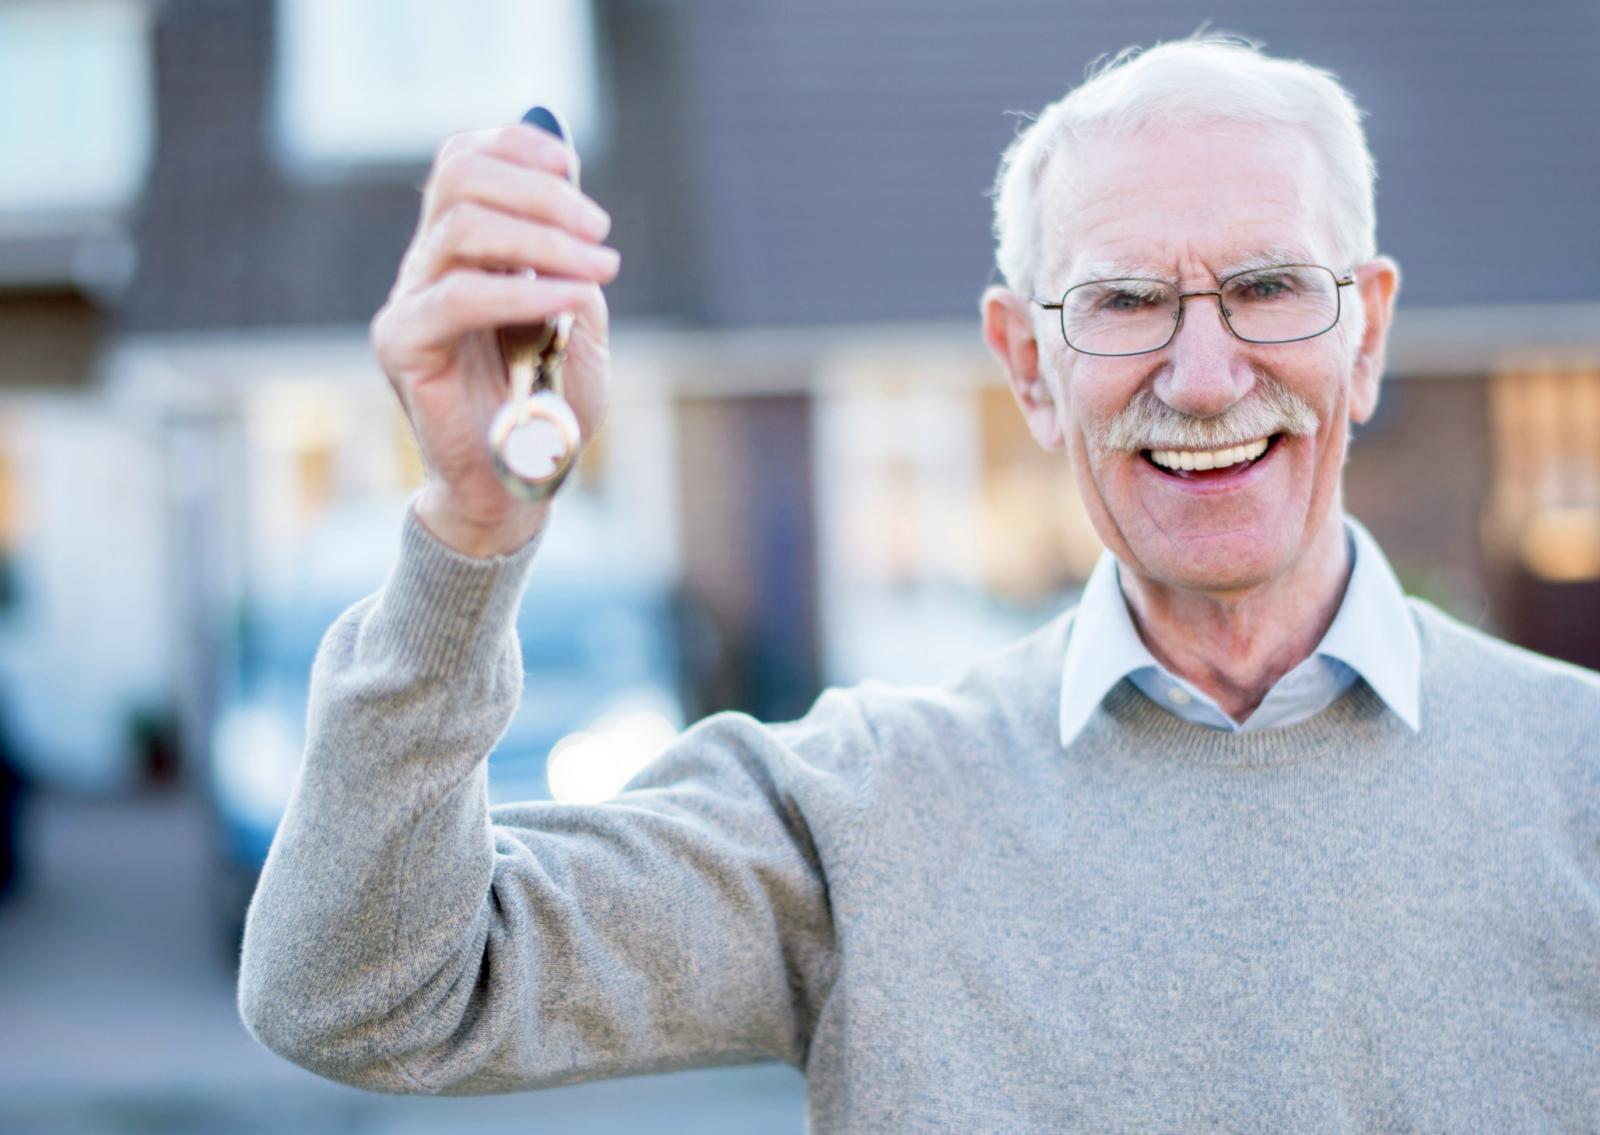 Senior man holding keys to his house